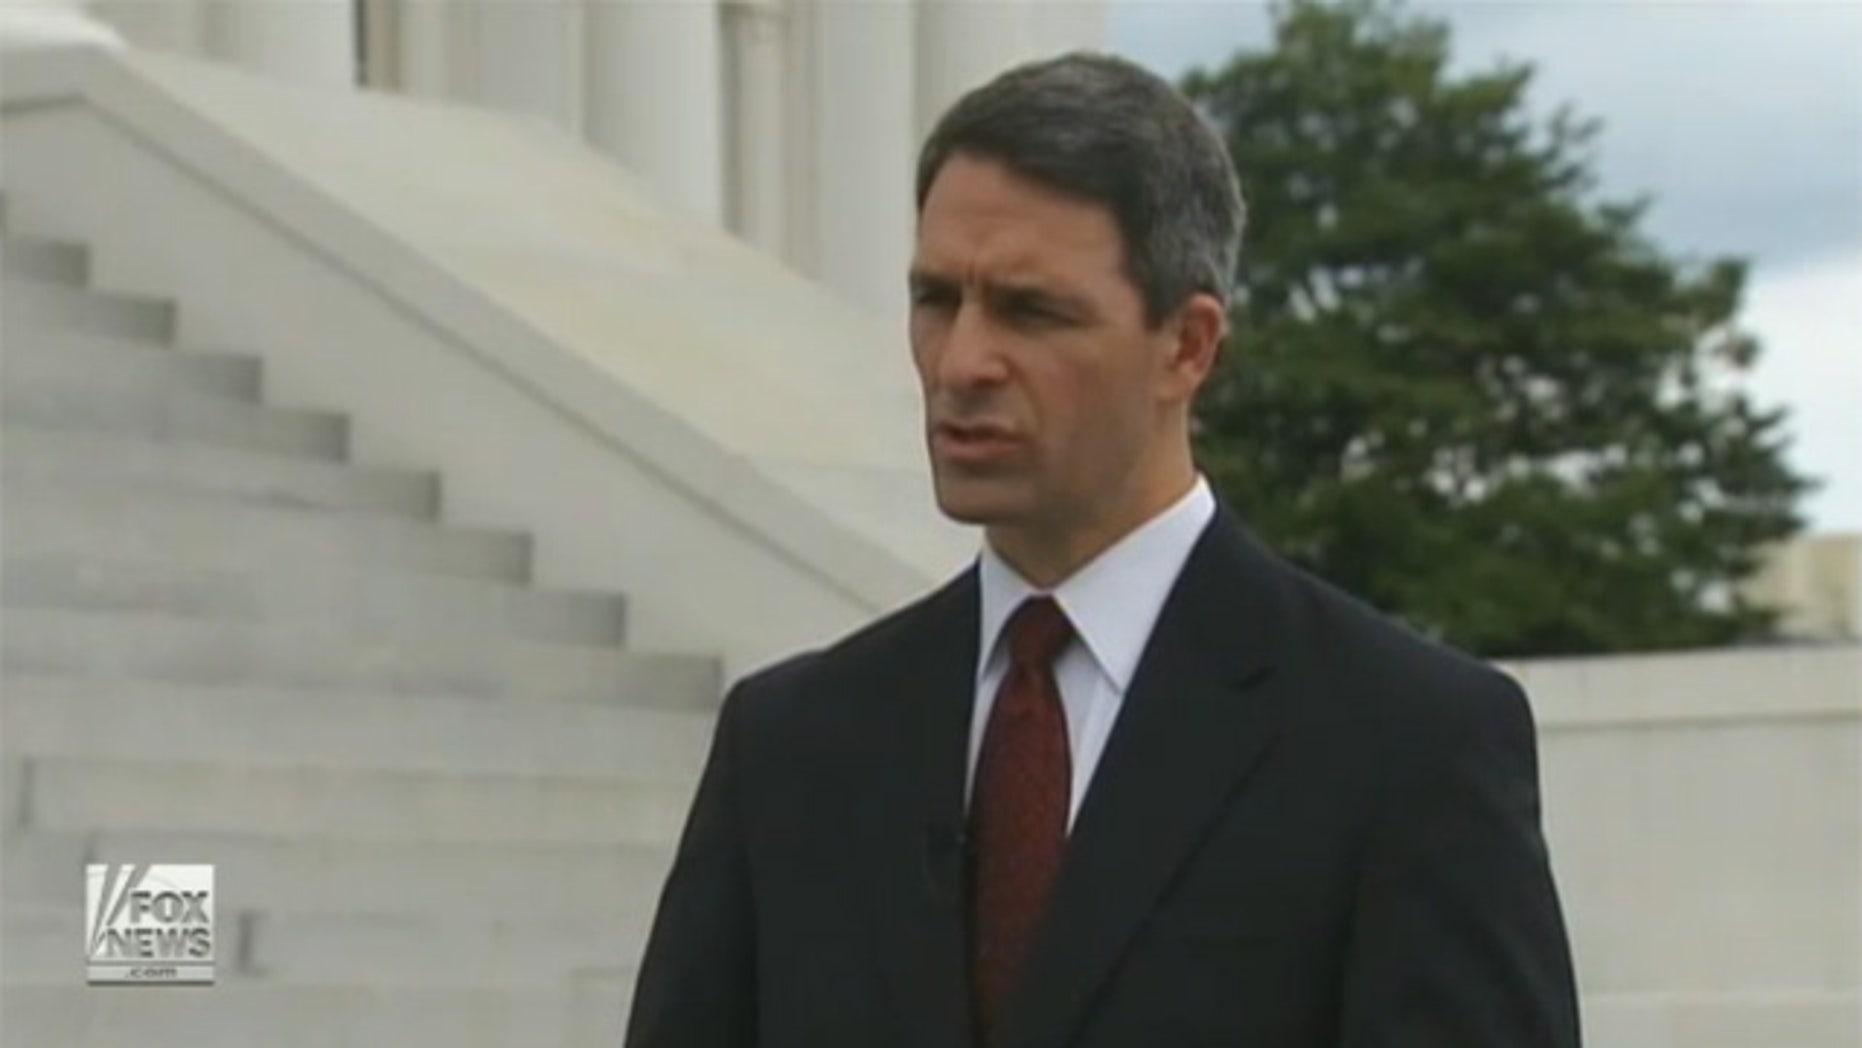 FILE: Virginia Attorney General Ken Cuccinelli. (FNC)